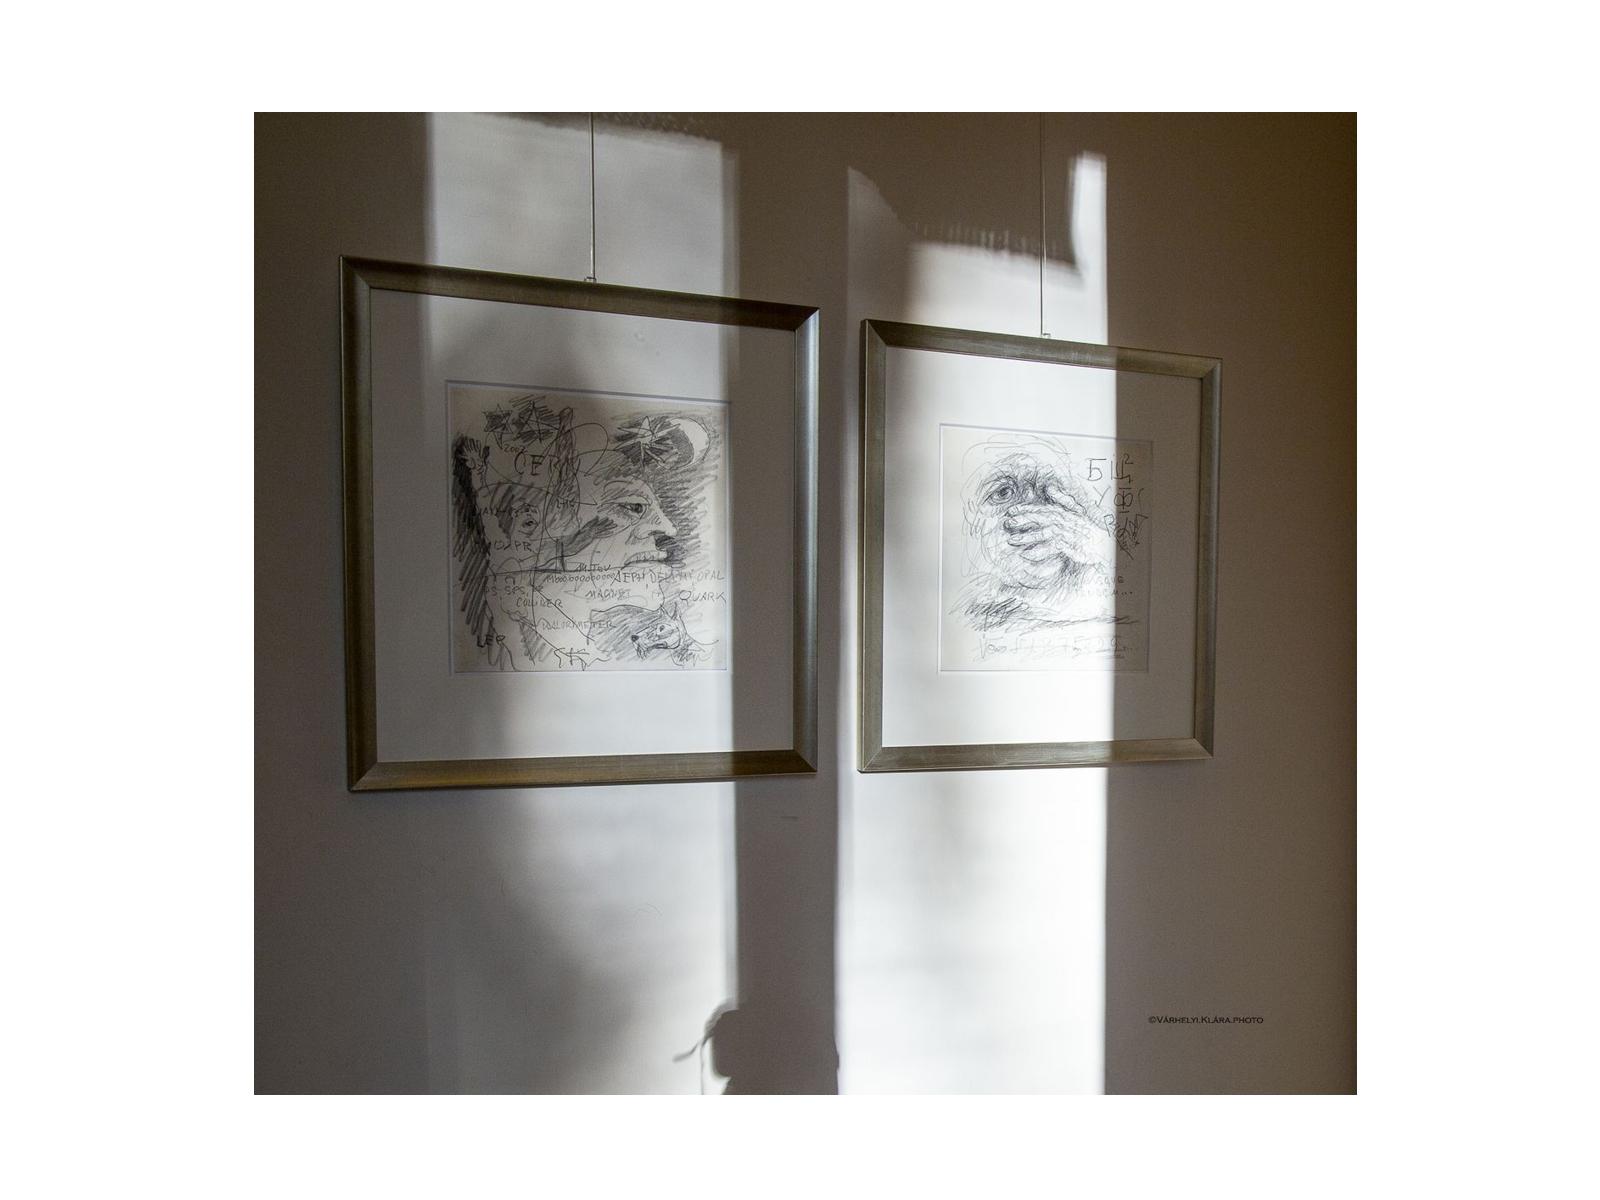 Karl-Stengel.-Con-cuore-puro.-Exhibition-view-at-Accademia-dUngheria-Roma-2020.-Photo-Klára-Várhelyi-_6_